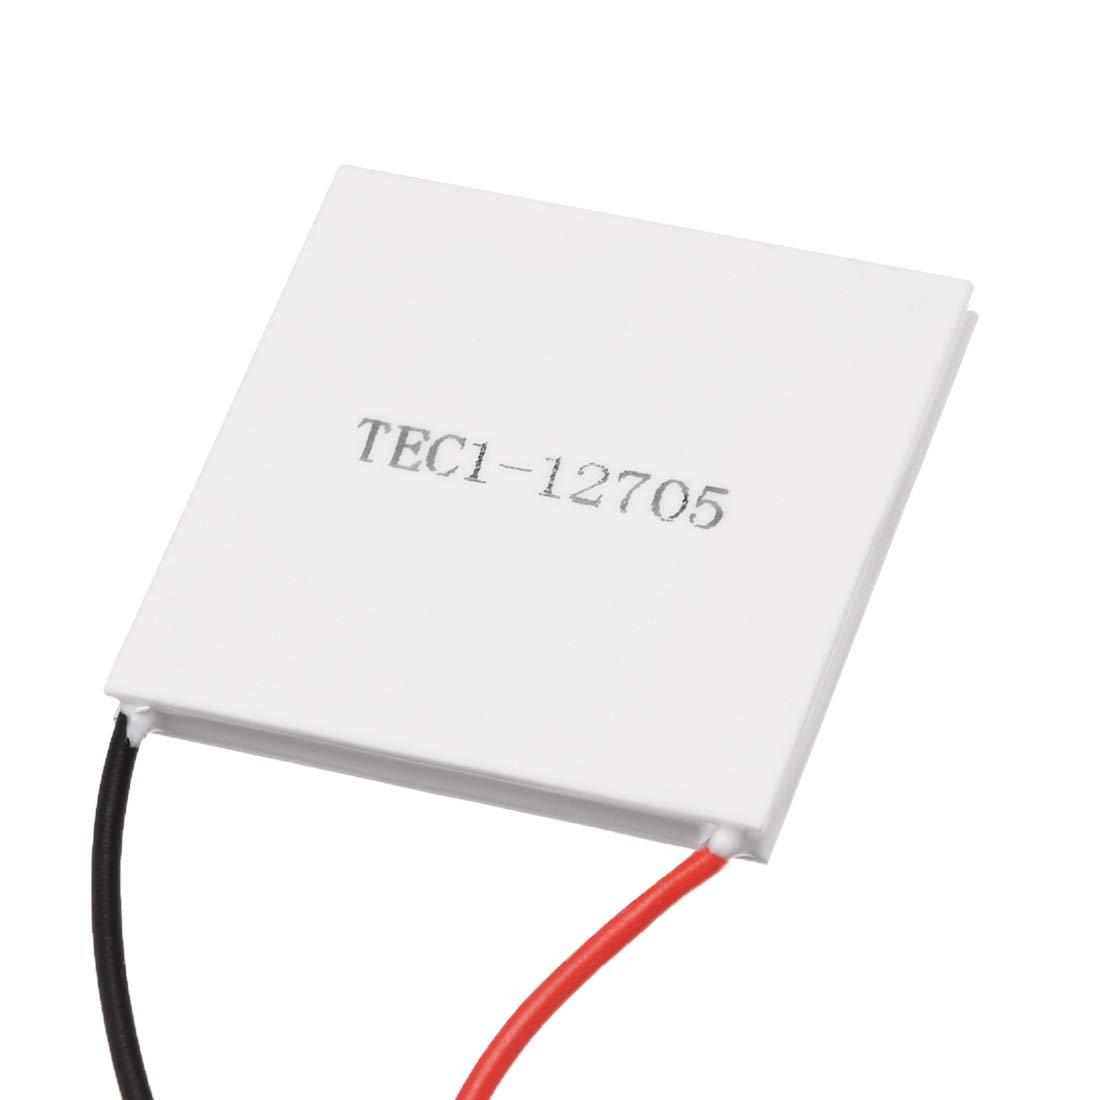 uxcell TEC1-12705 Thermoelectric Cooler Heat Sink Cooling Peltier 12 Volt 30 Watt